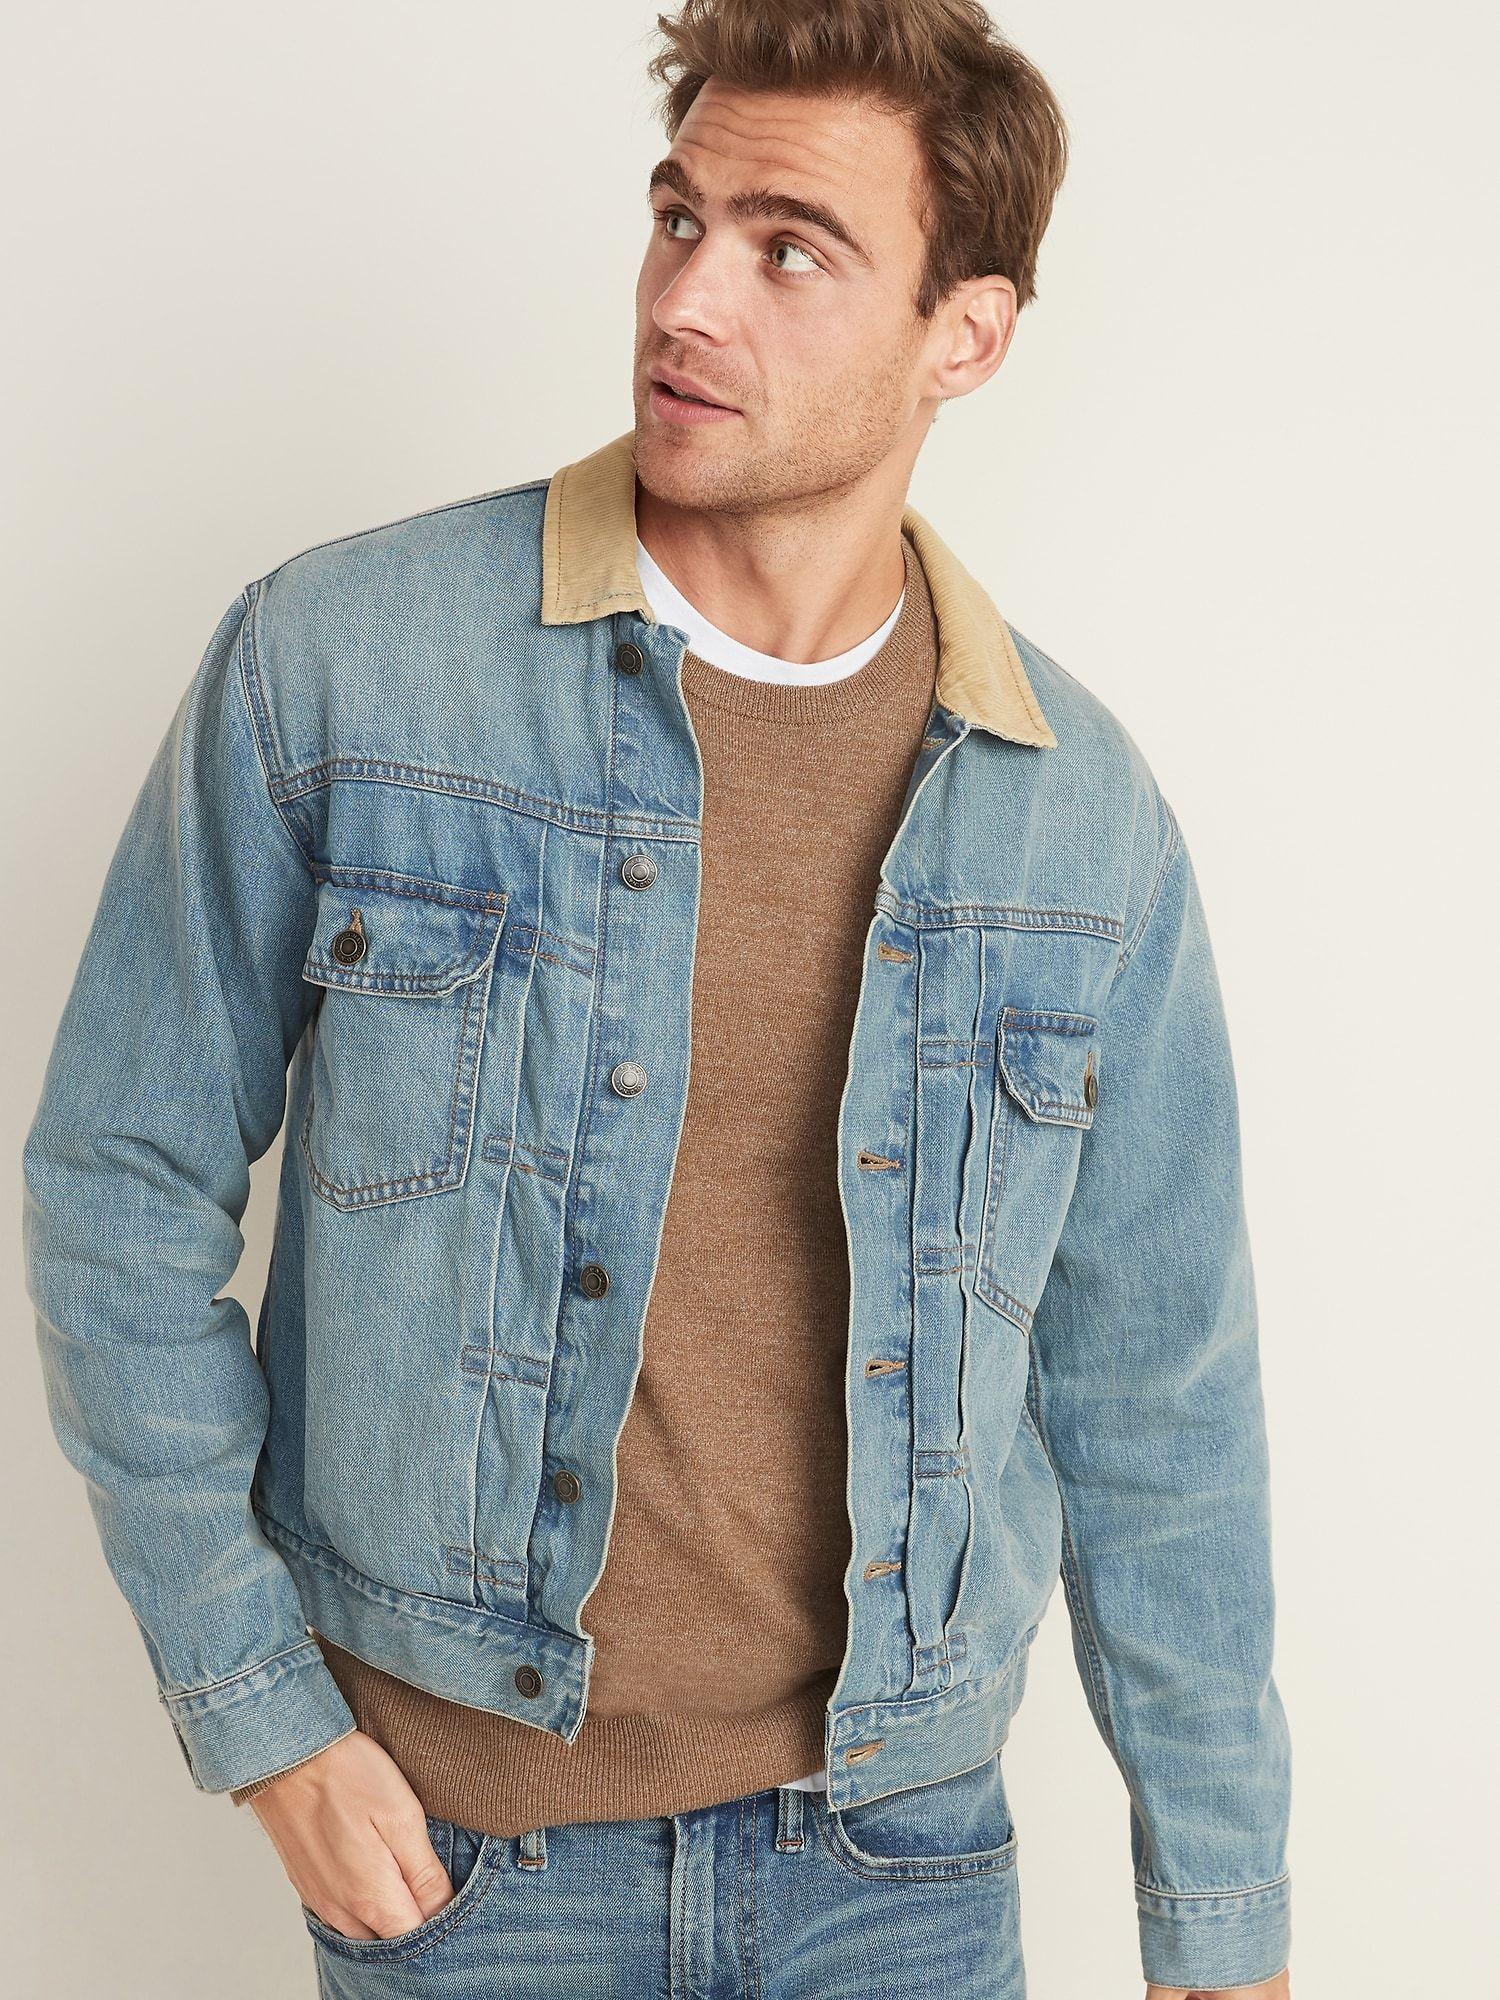 Corduroy Collar Jean Jacket For Men Old Navy Mens Jeans Guide Jeans Outfit Men Mens Fashion Jeans [ 2000 x 1500 Pixel ]